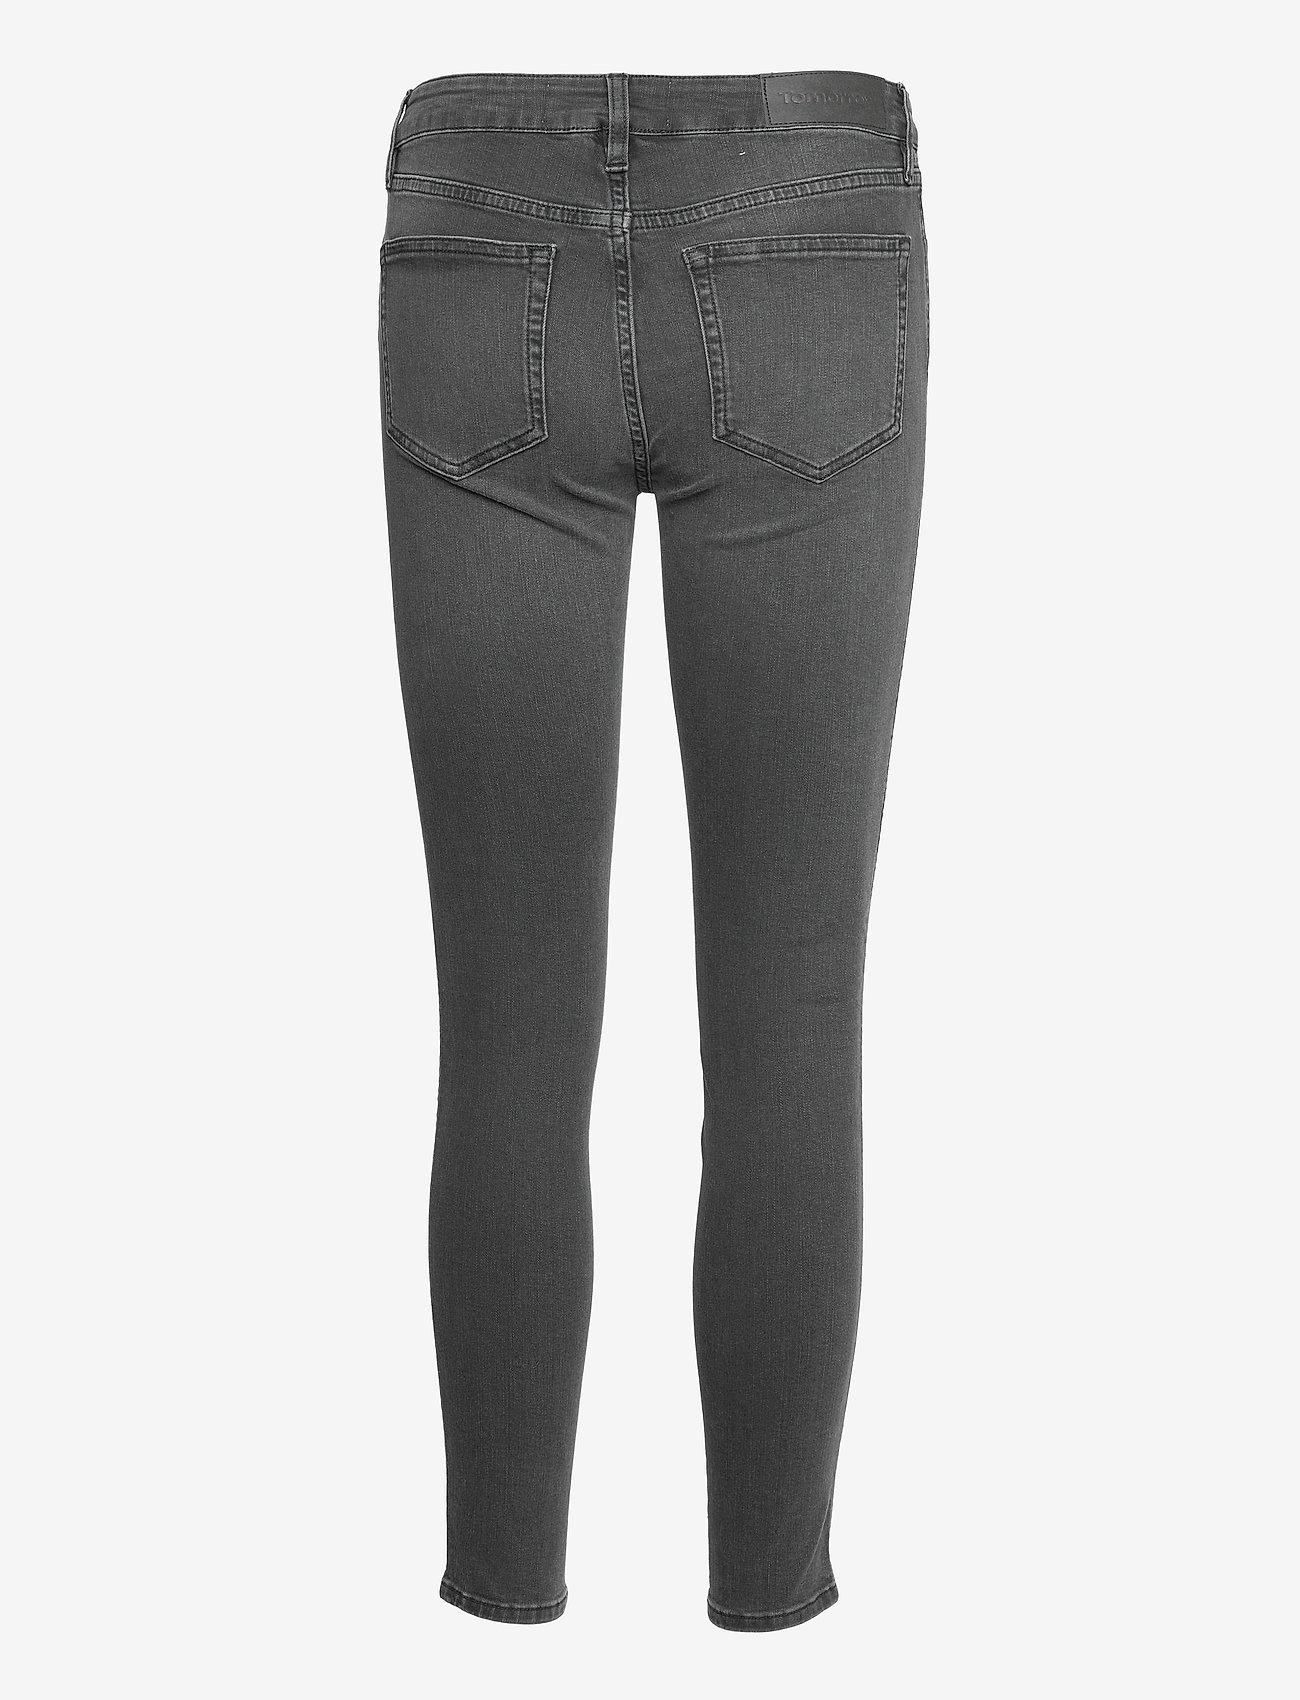 Tomorrow - Dylan MW cropped charcoal grey - skinny jeans - grey - 1